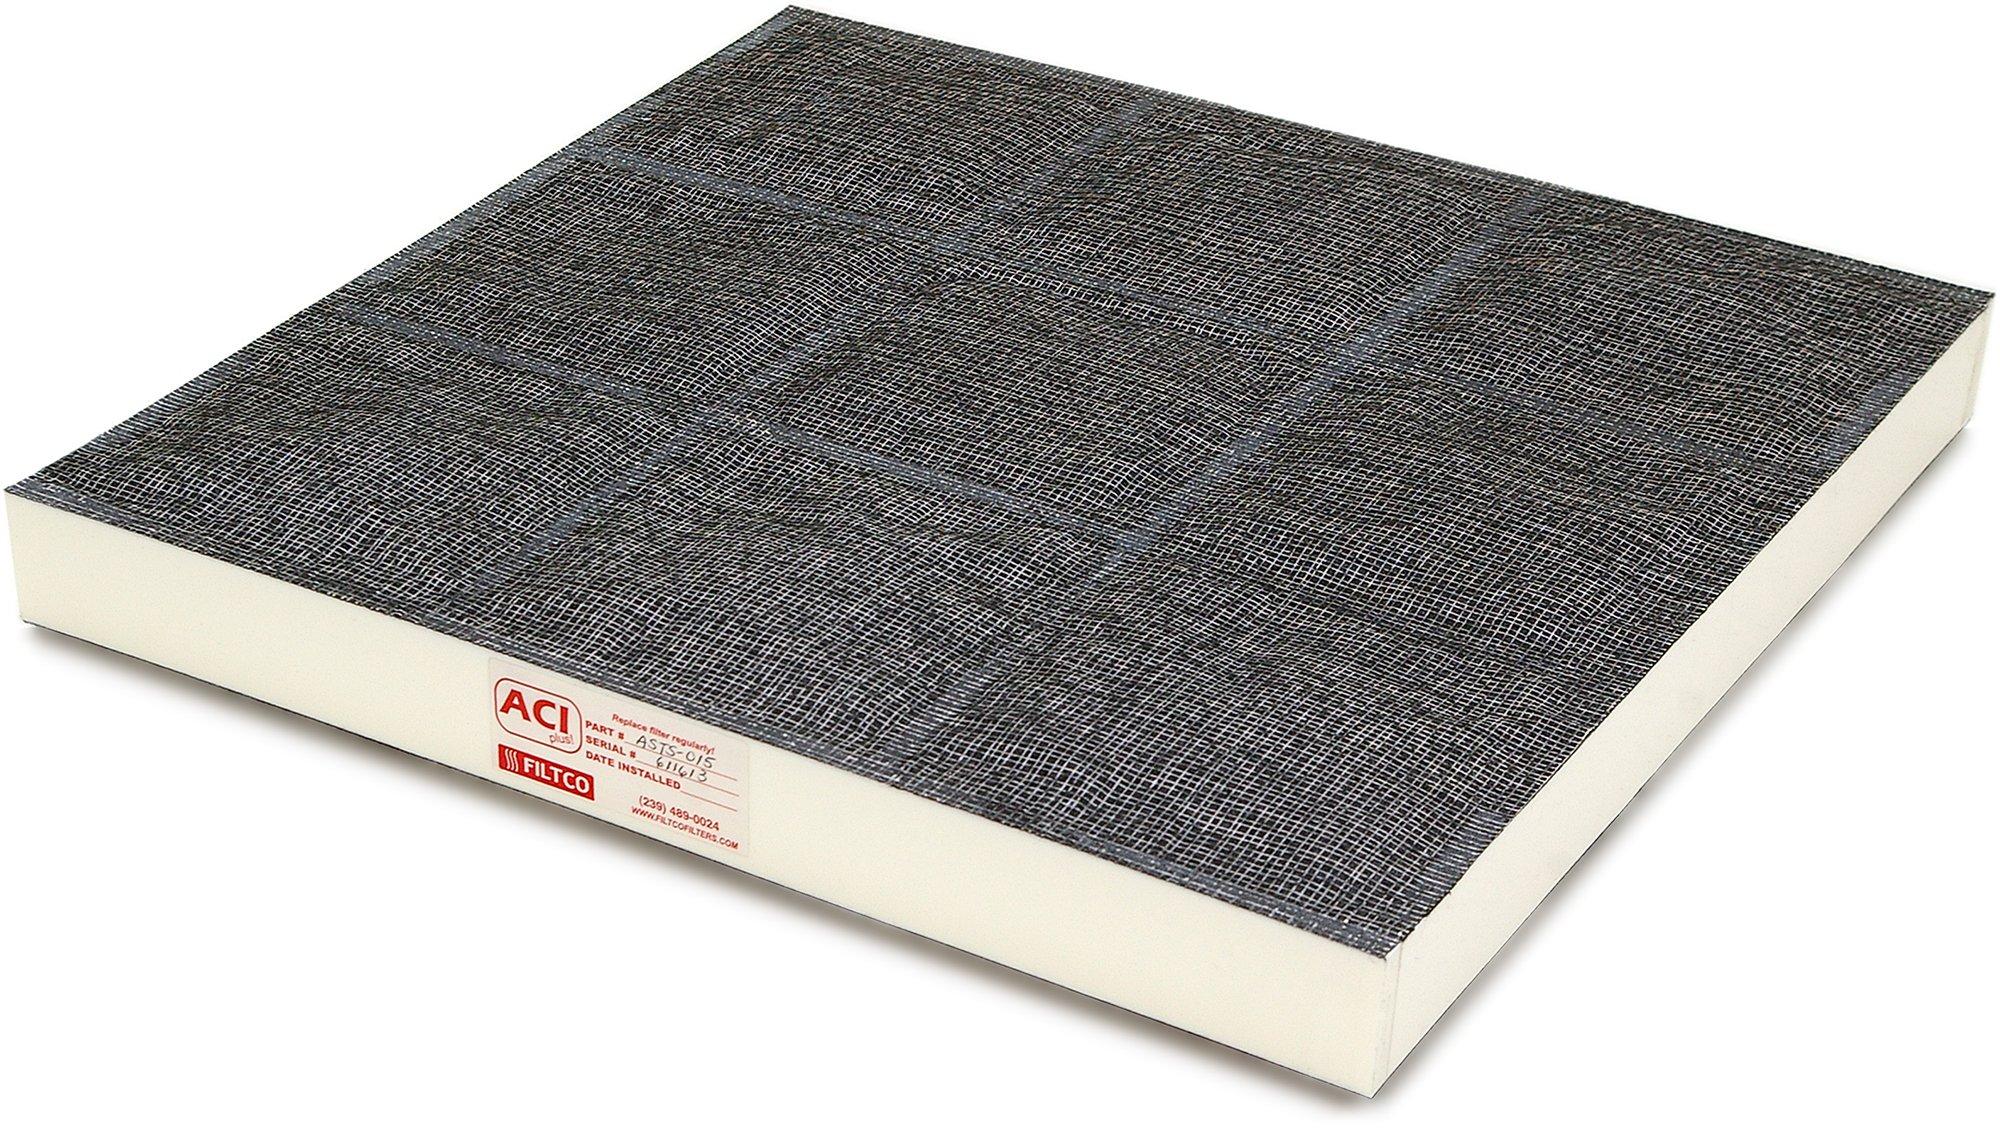 Purair Basic ASTS-015 ACI Plus Carbon Filter